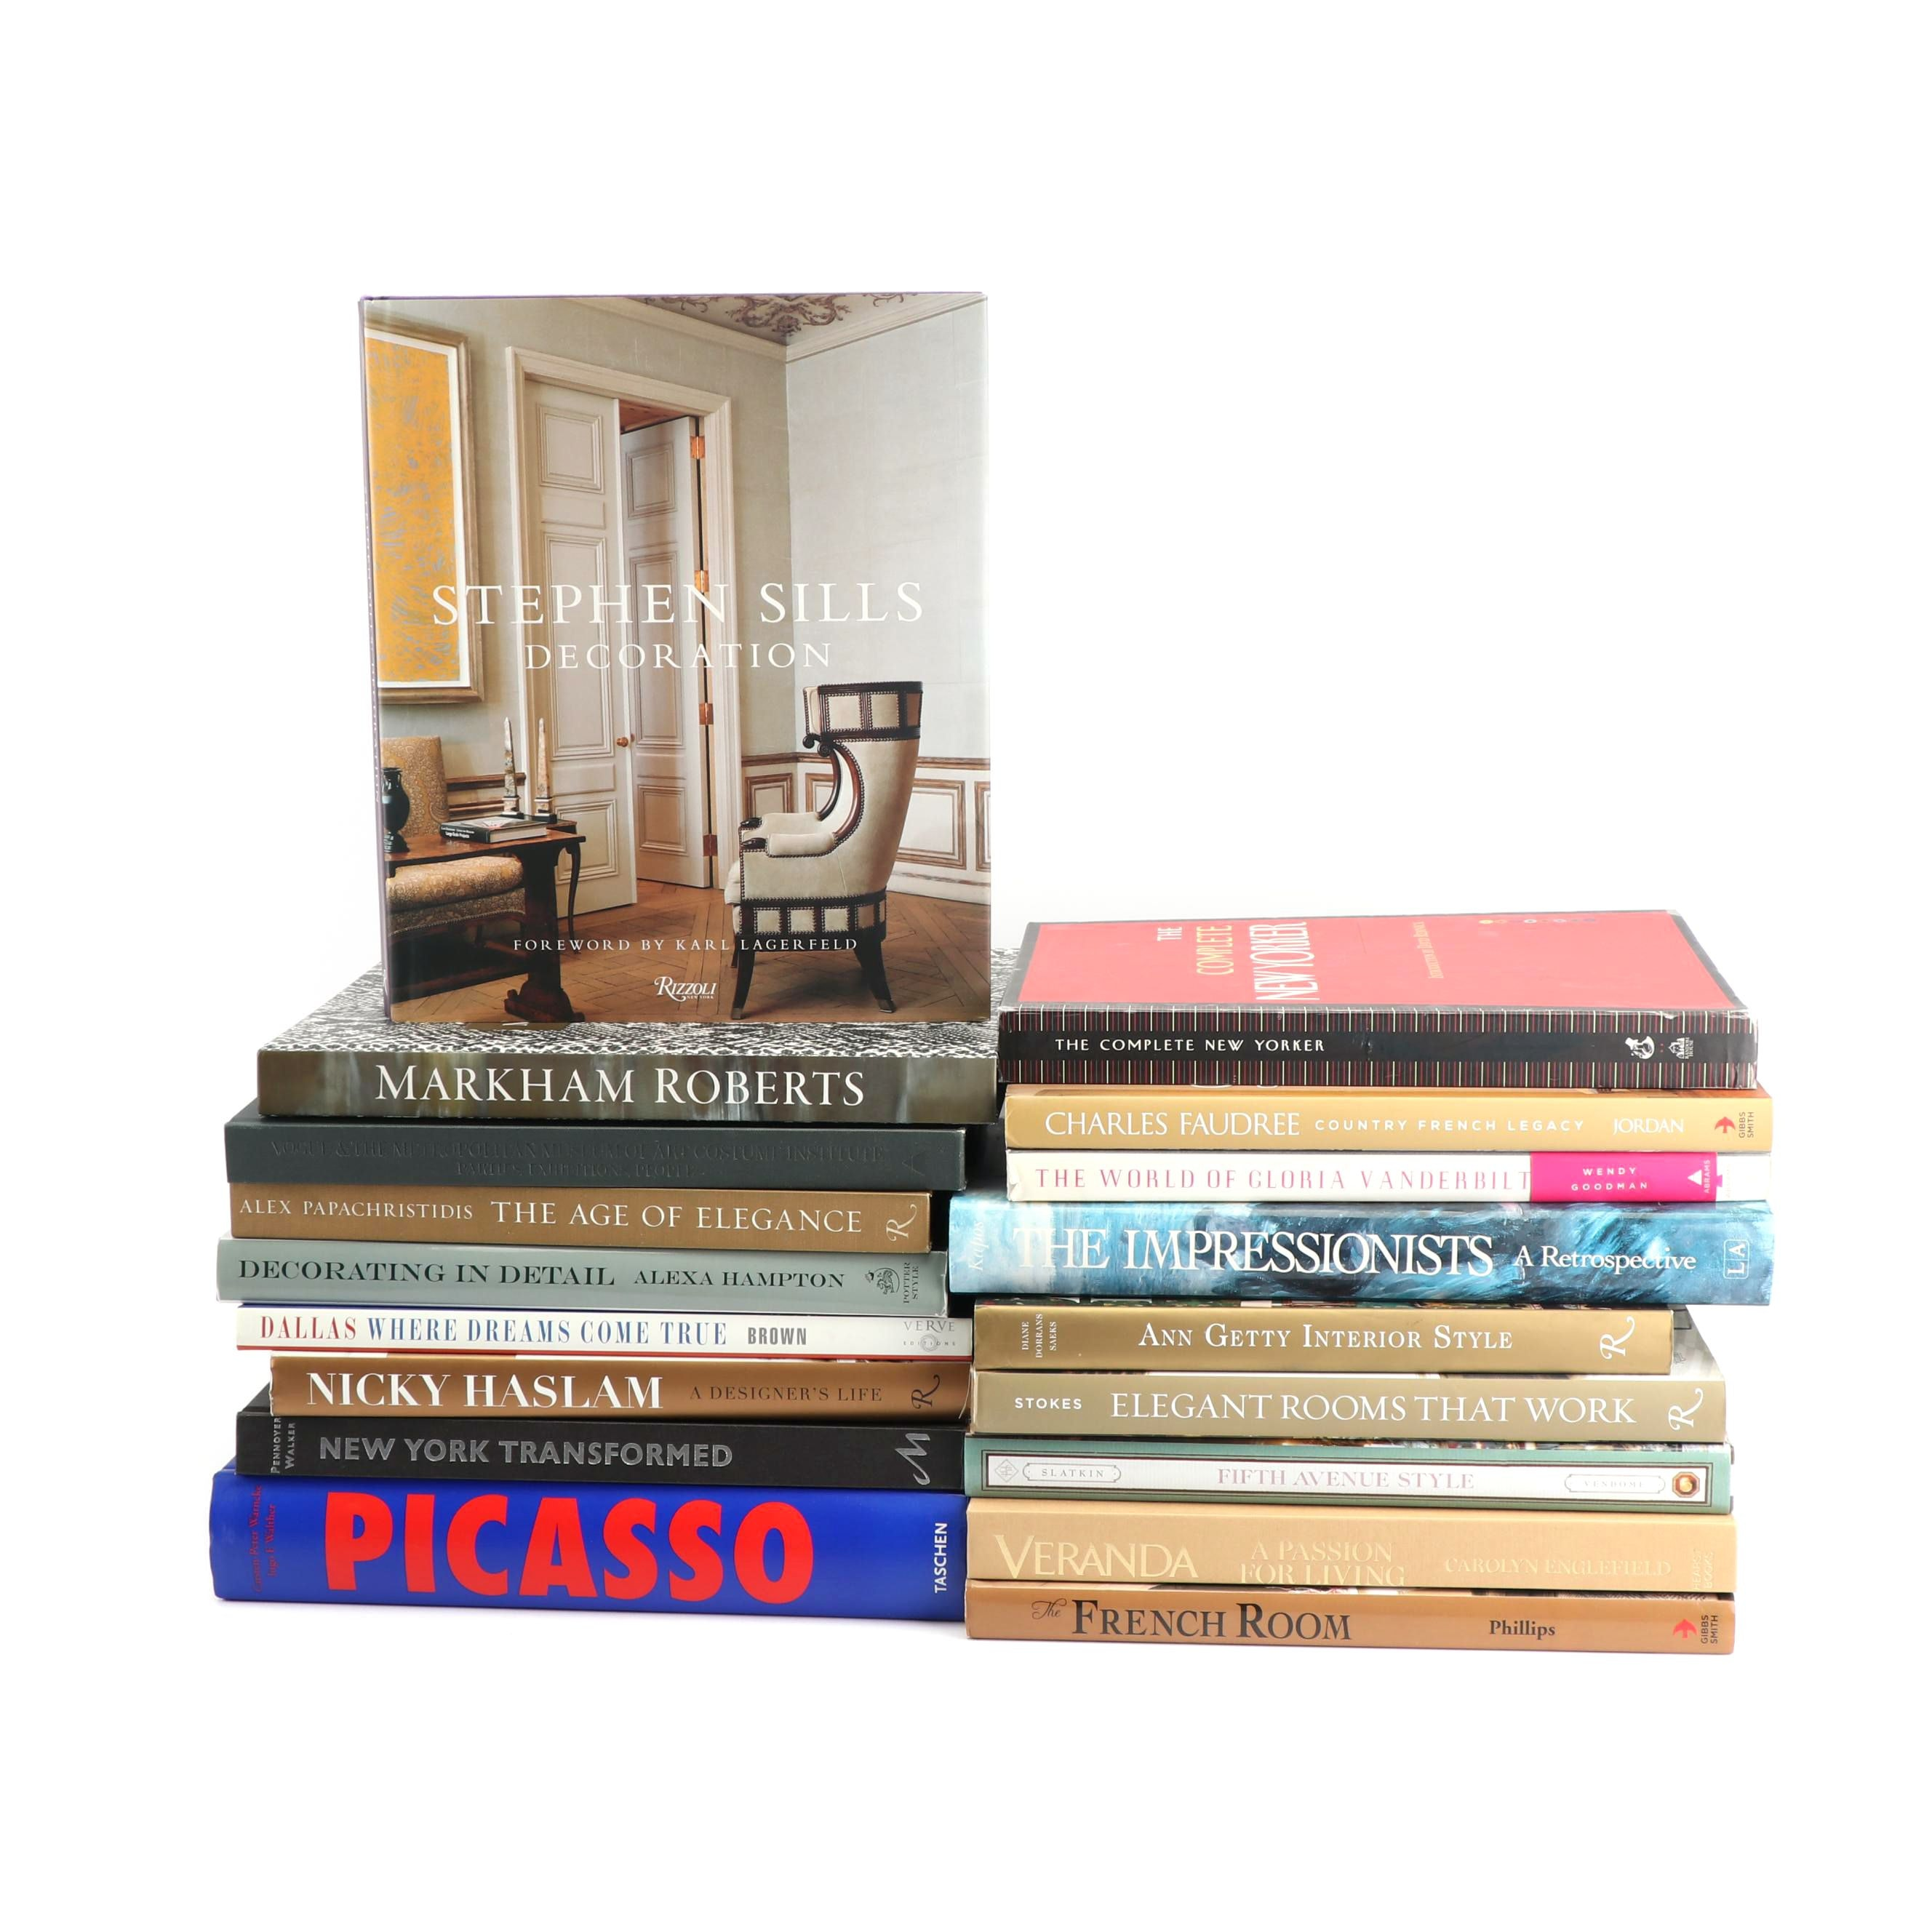 Books including Art, Design and Fashion